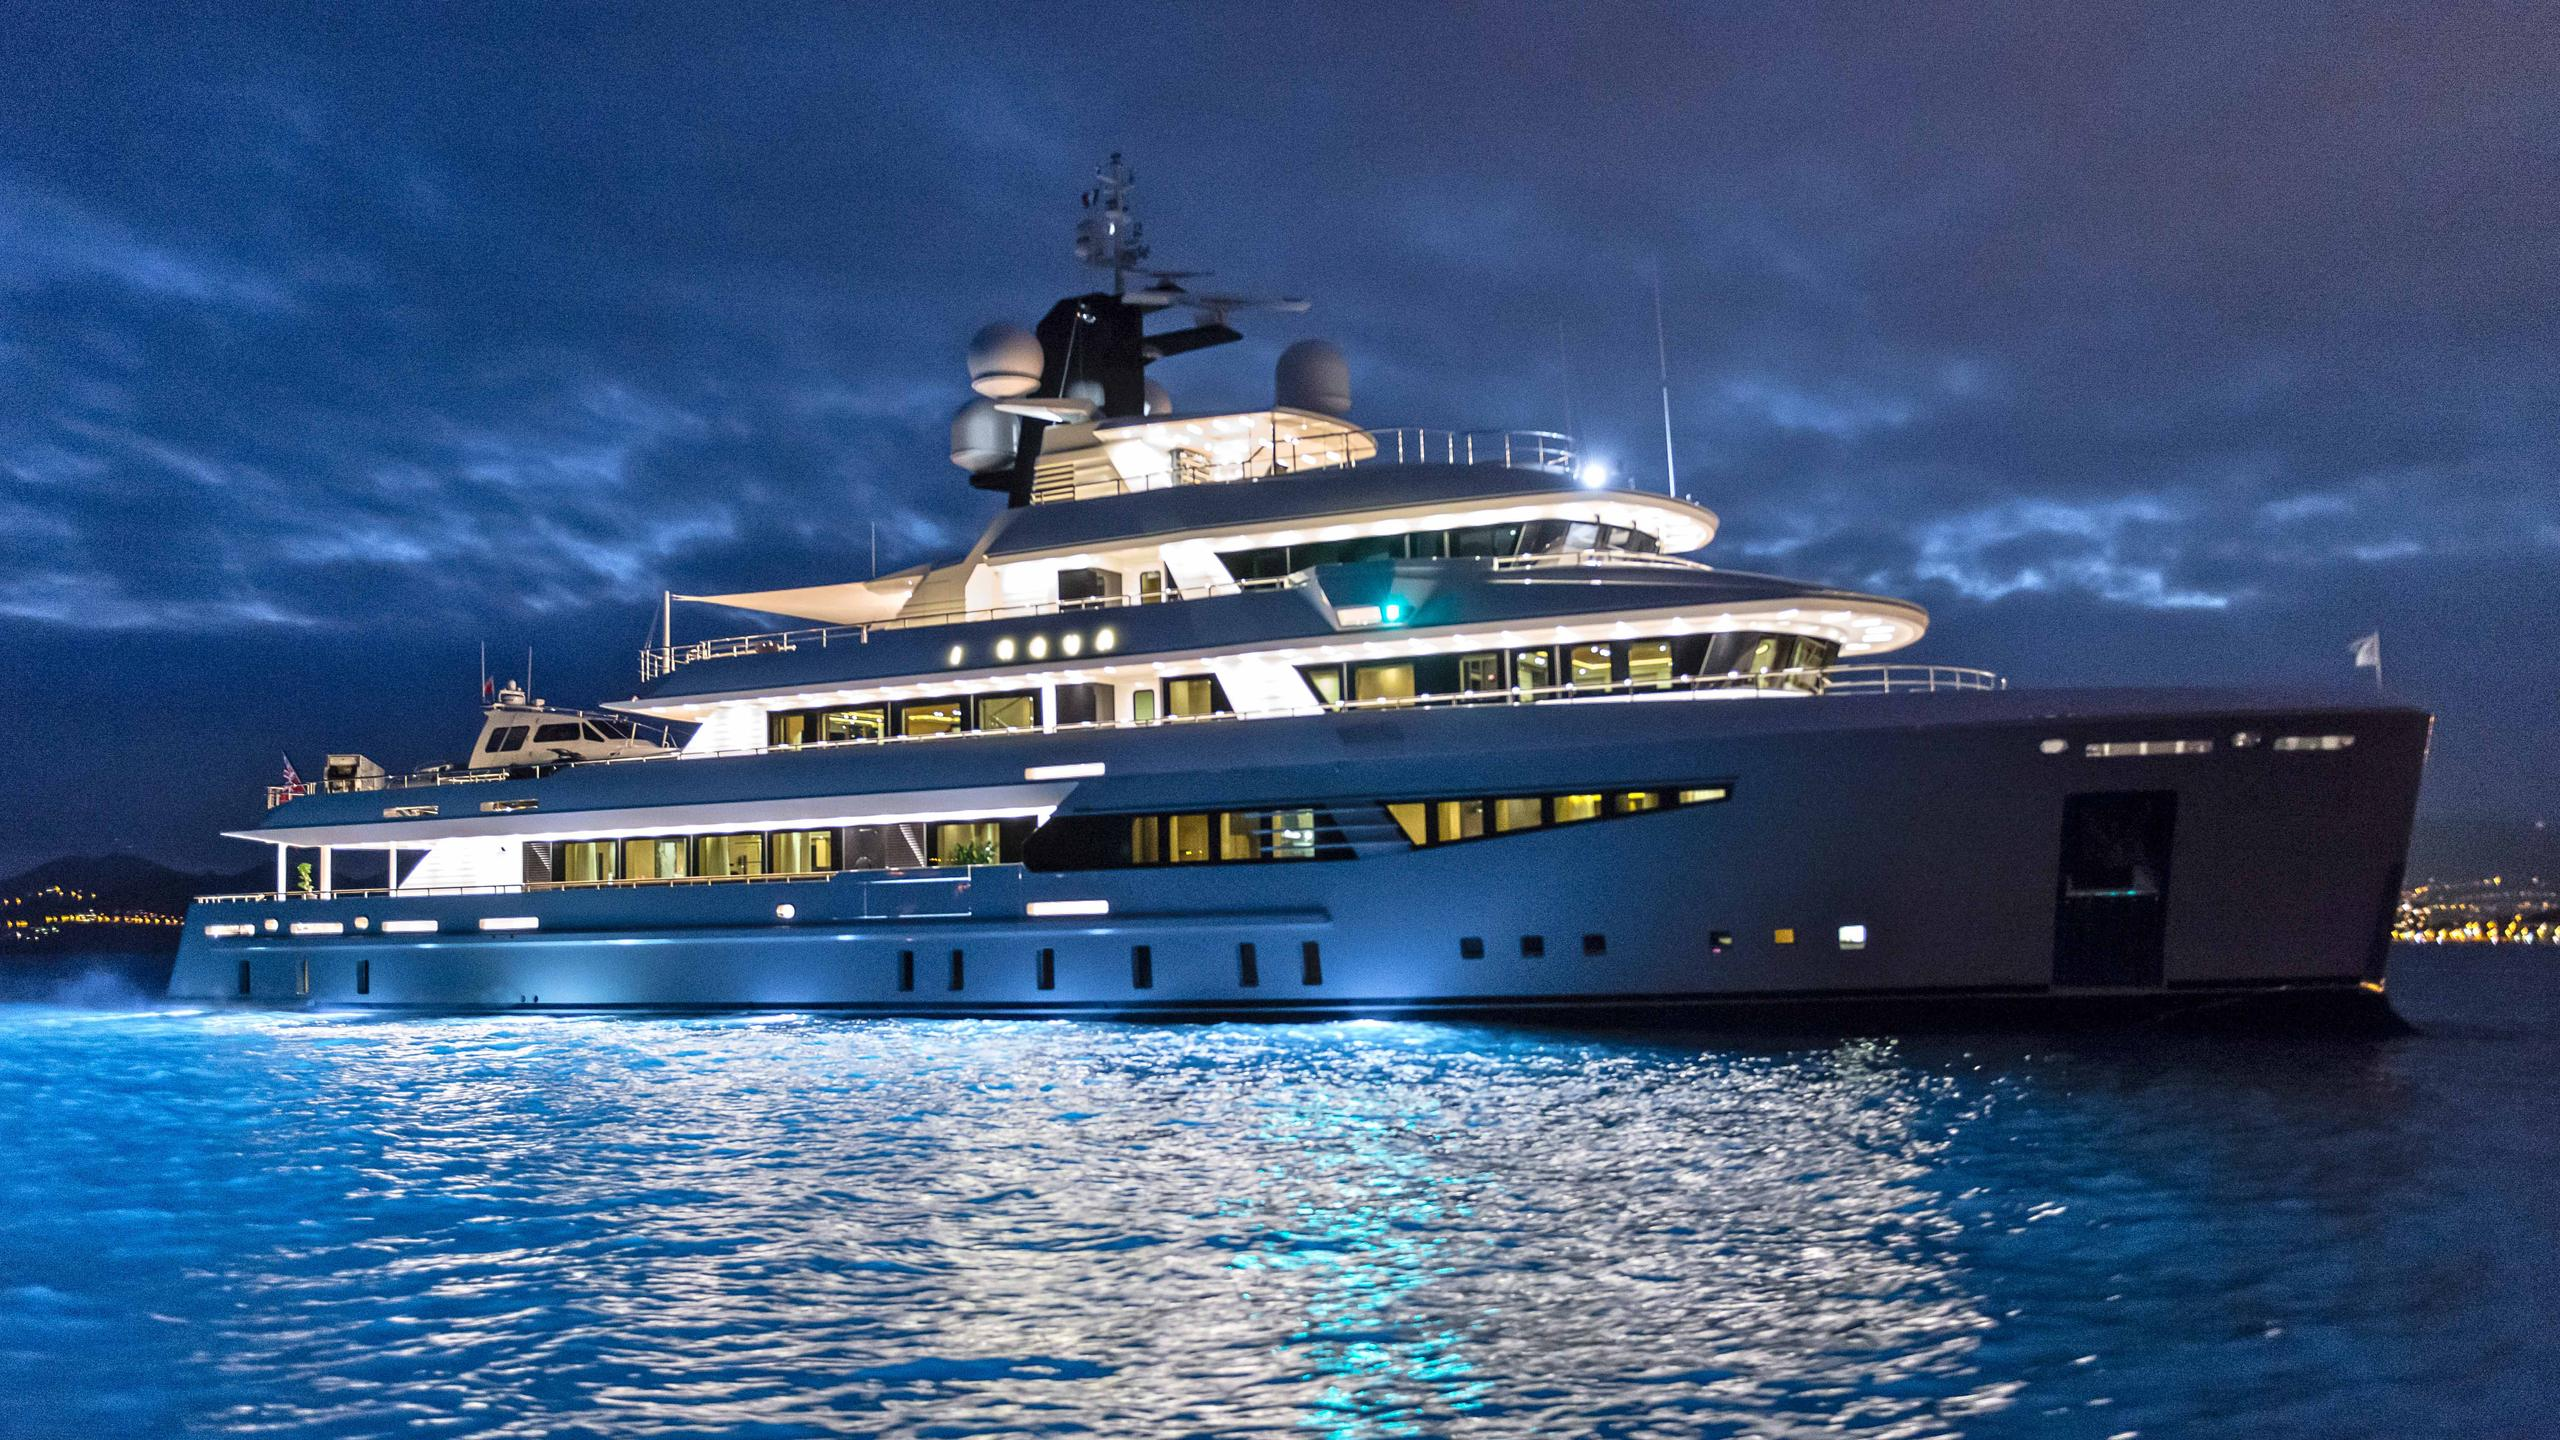 i-nova-explorer-yacht-cosmo-2013-50m-profile-by-night